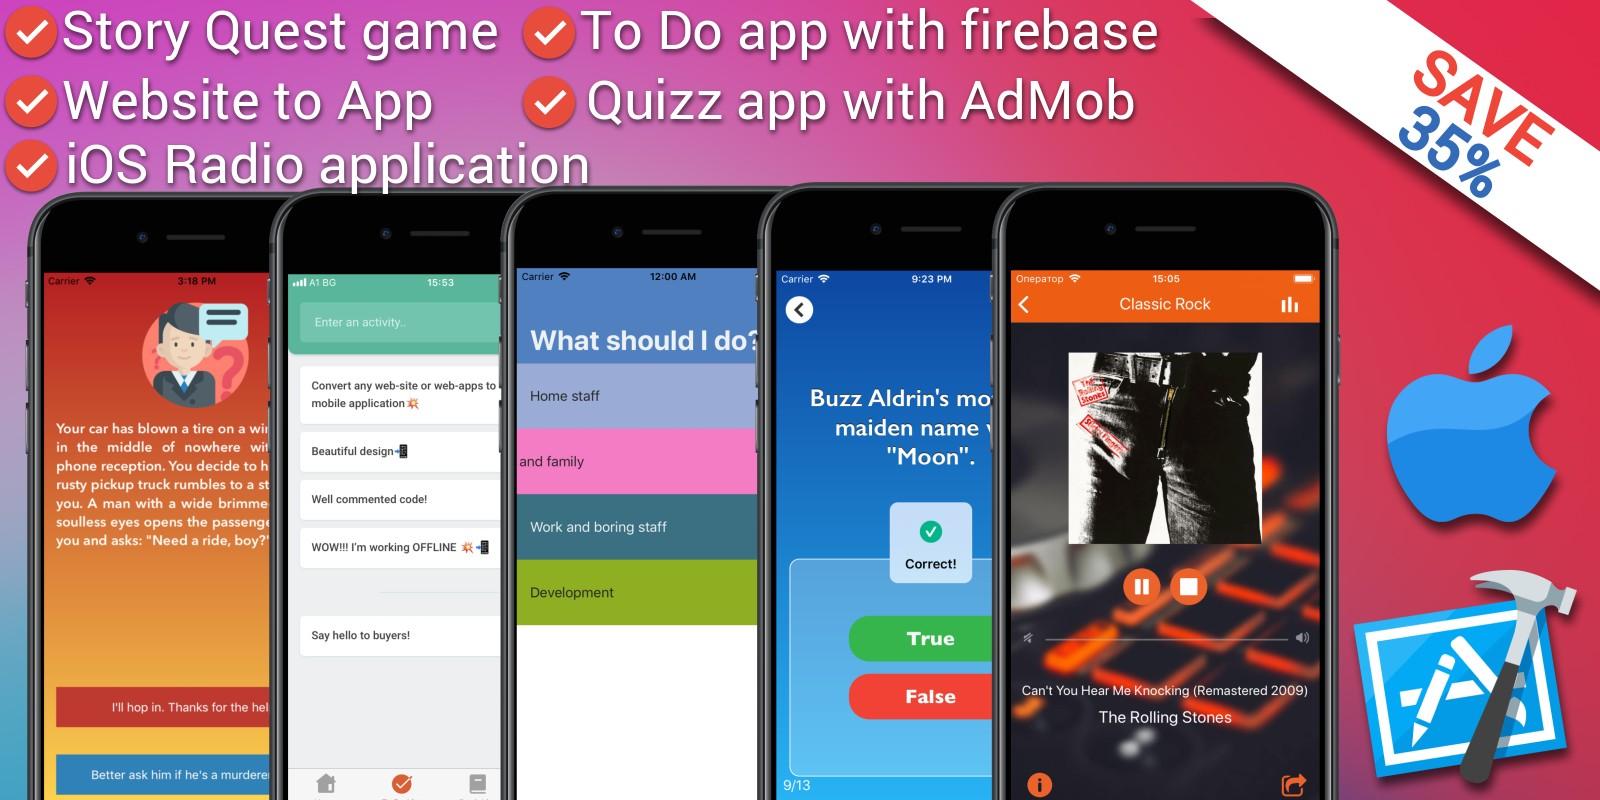 iOS Applications bundle